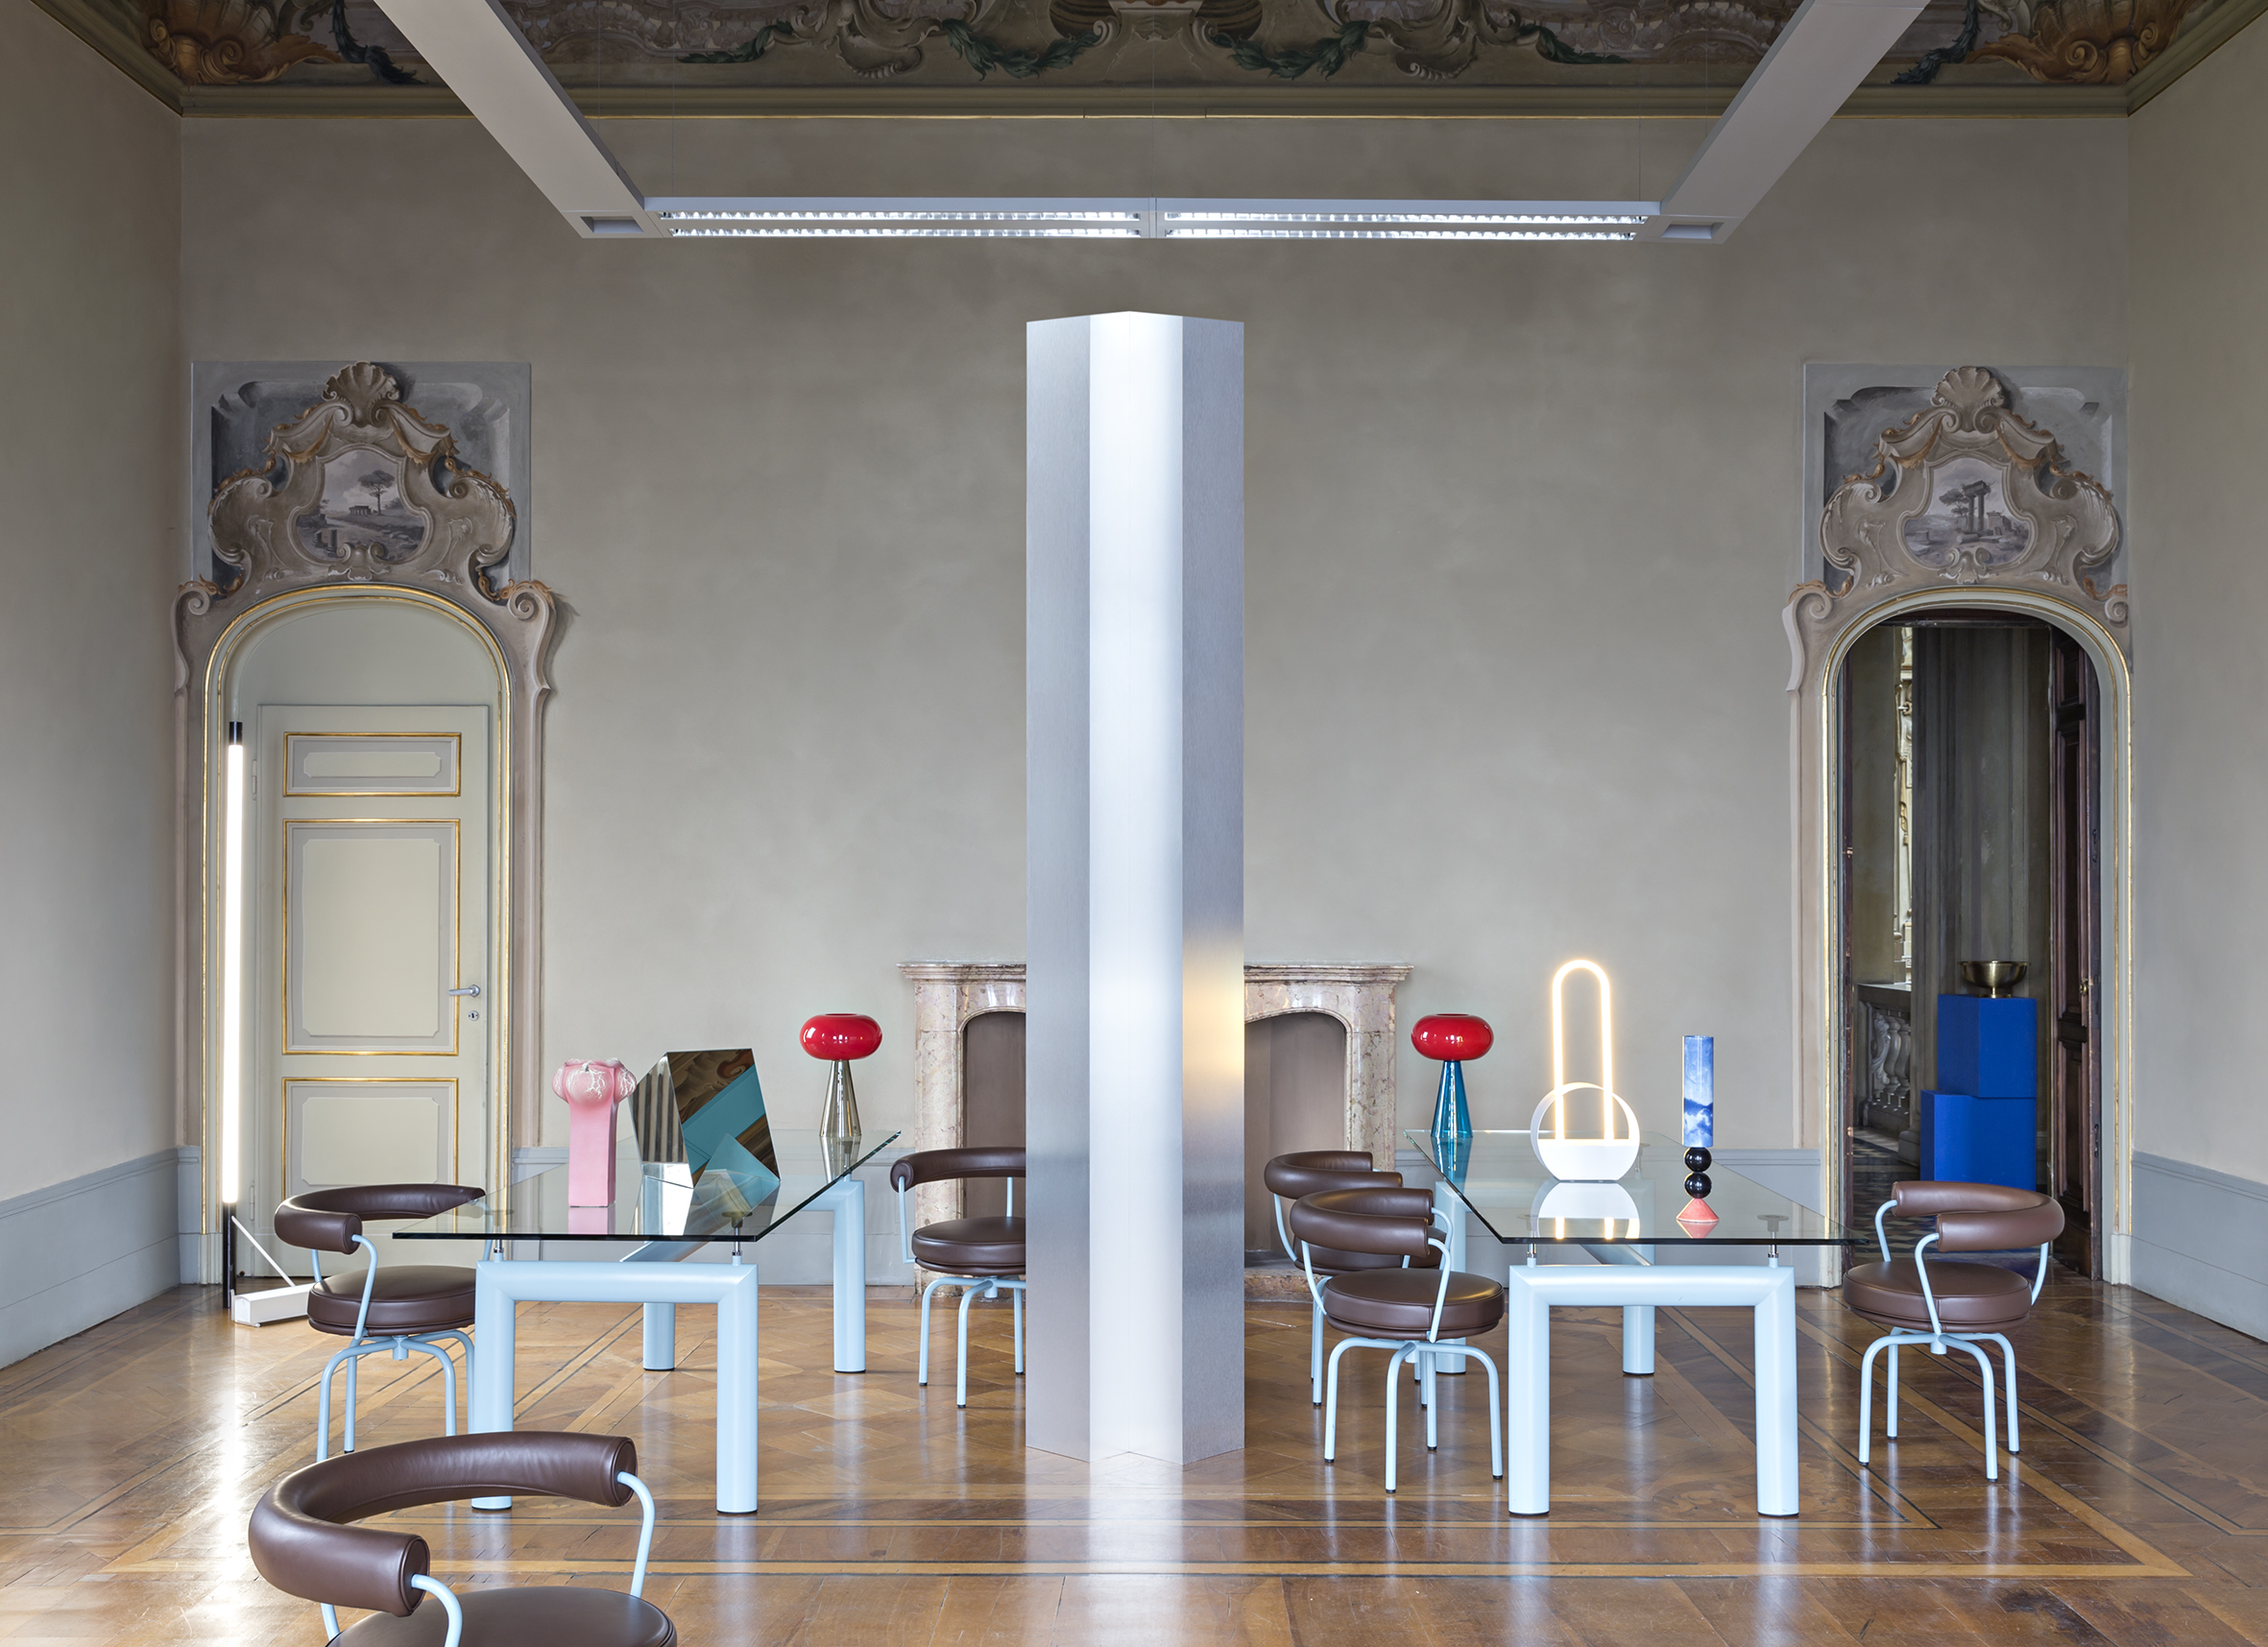 10_CASSINA_This Will Be The Place_Artful Living_3∏Giuseppe Brancato.jpg